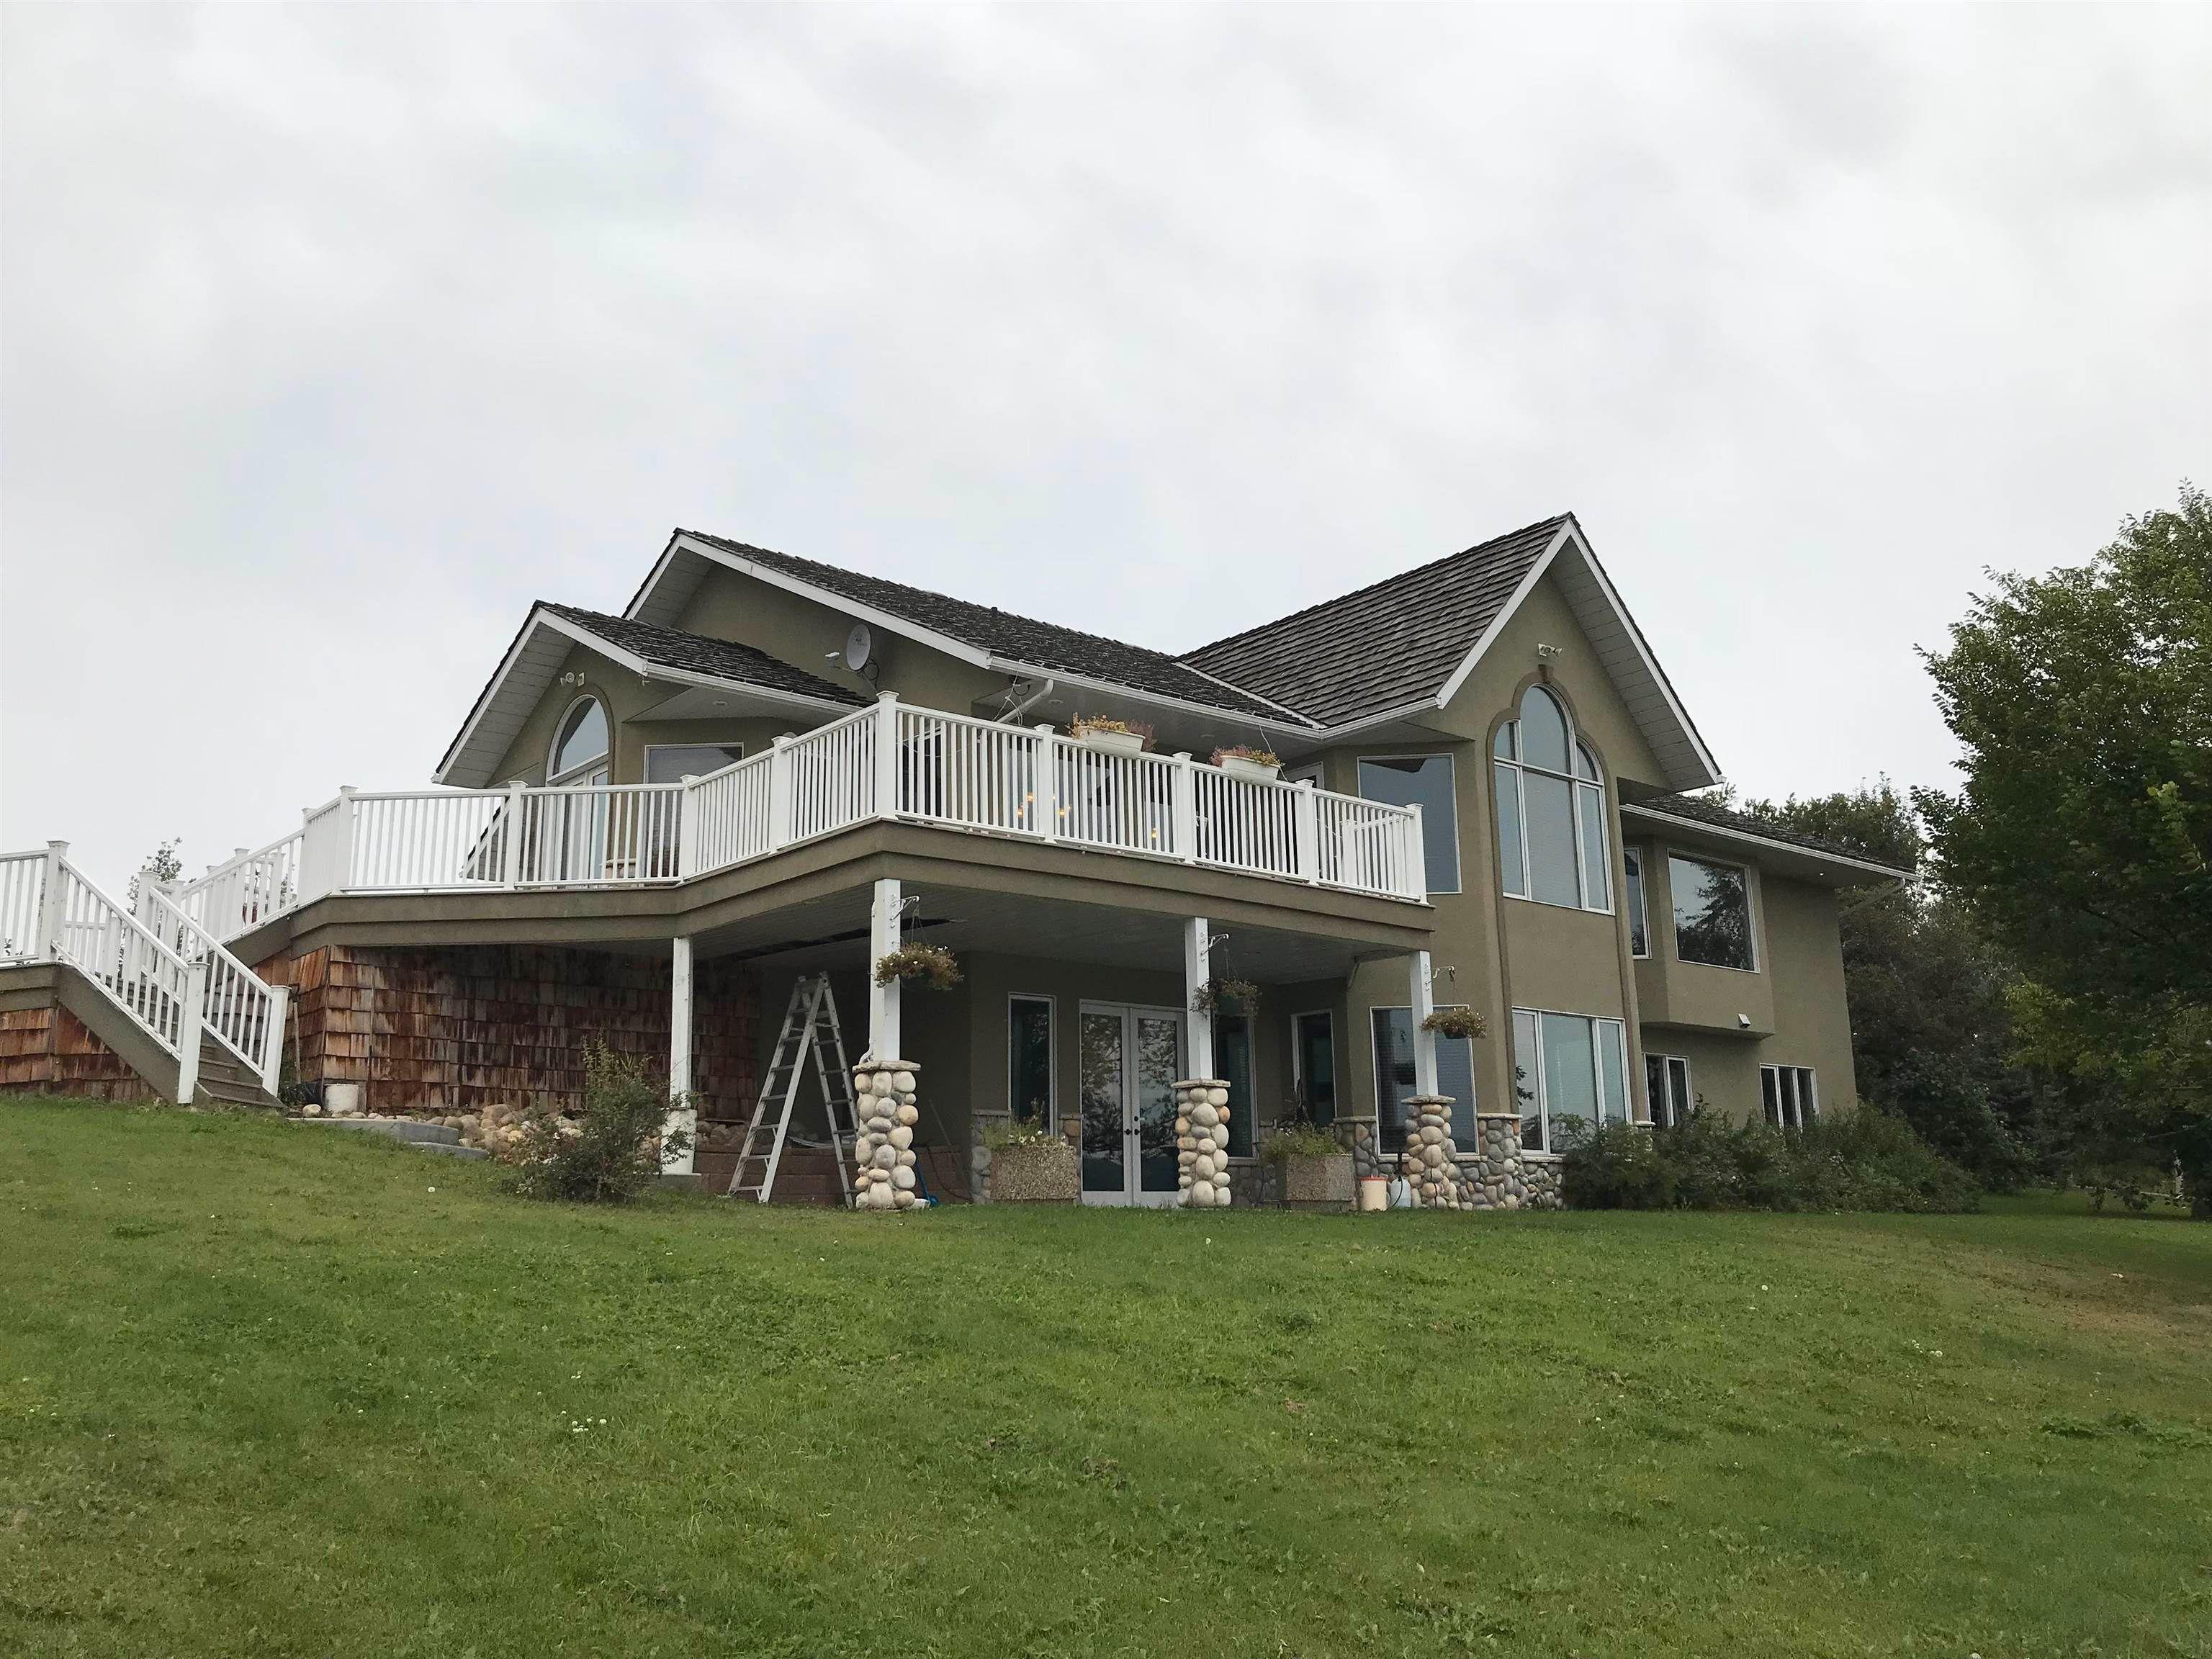 Main Photo: 13134 LAKESHORE Drive: Charlie Lake House for sale (Fort St. John (Zone 60))  : MLS®# R2613481